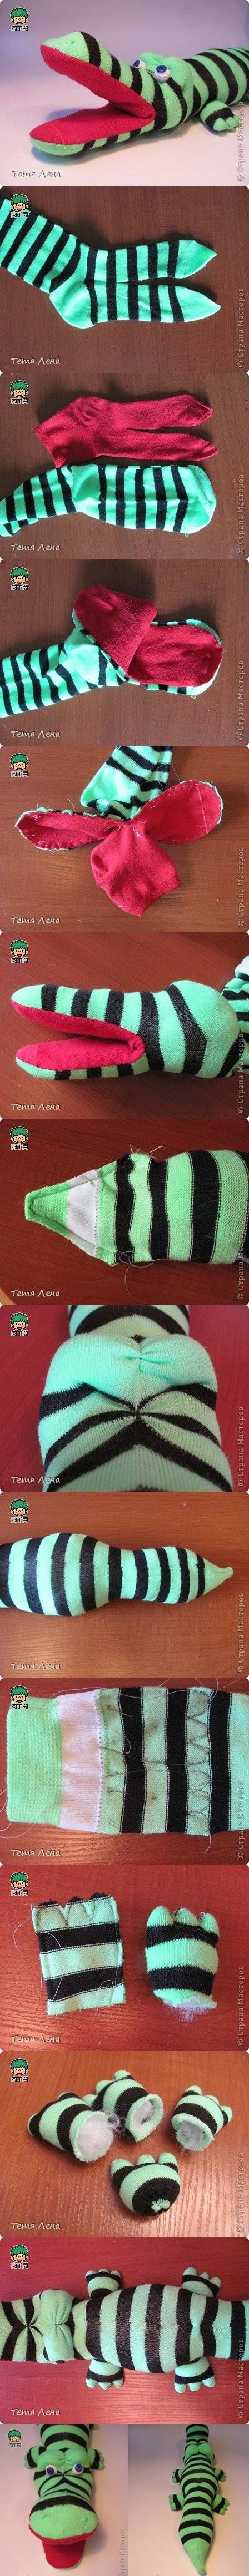 DIY Sock Crocodile Stuffed Animal DIY Projects /...